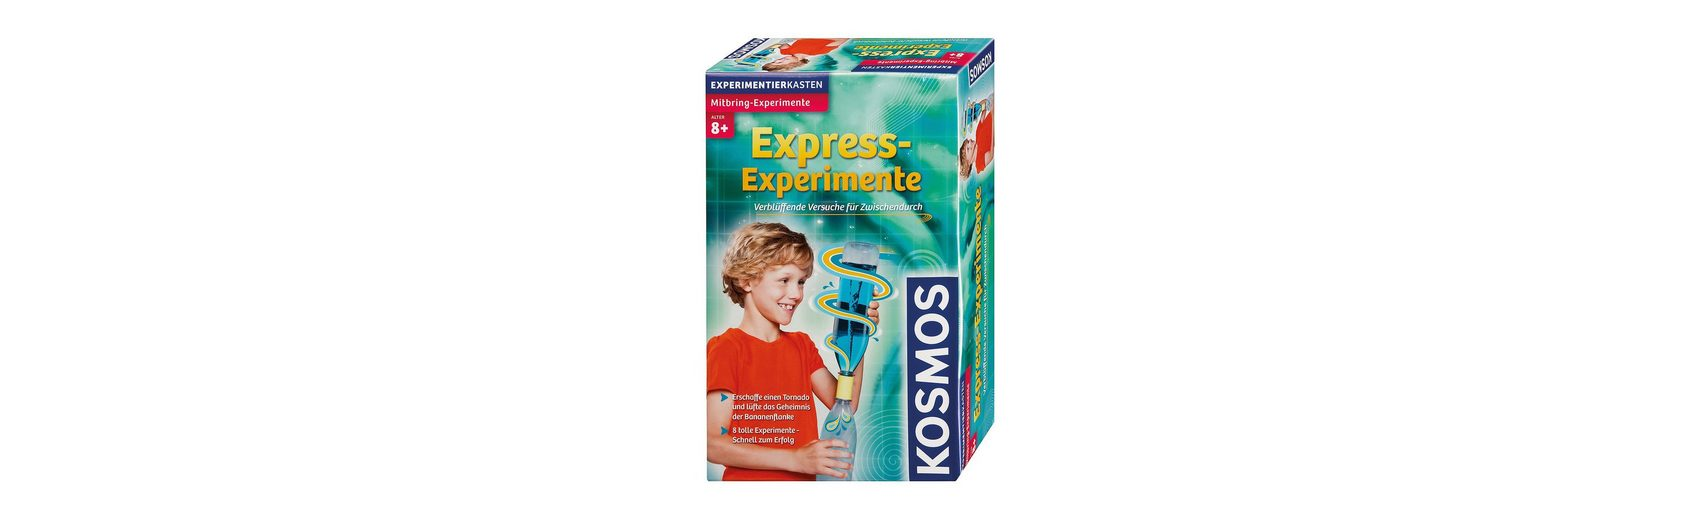 Kosmos Mitbringexperimente Express-Experimente